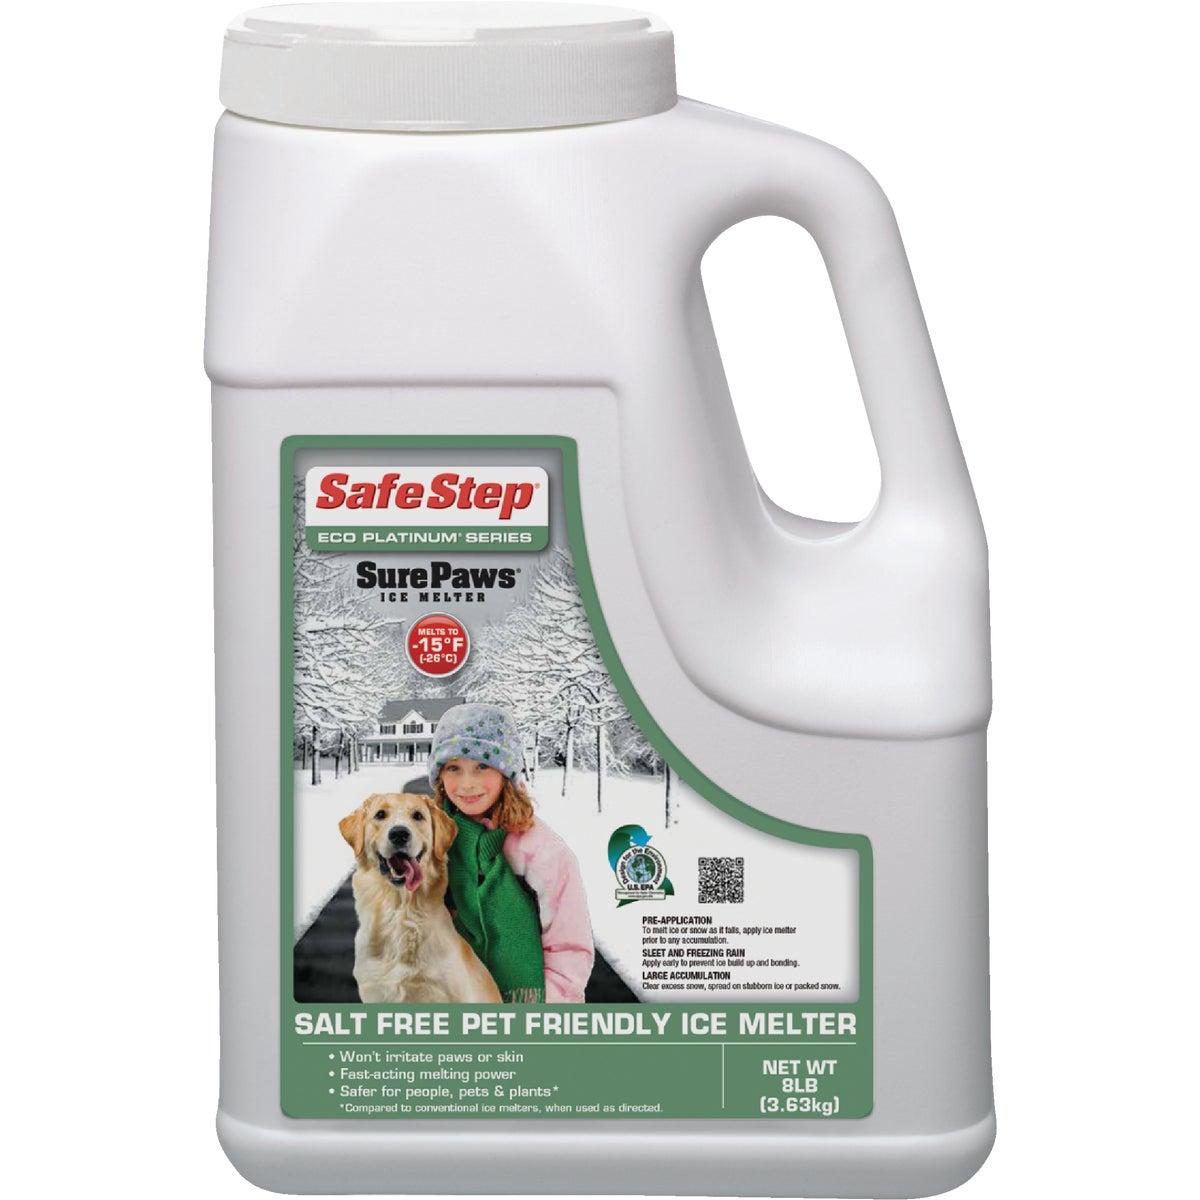 8LB PET SAFE ICE MELTER - 56708 by North American Salt